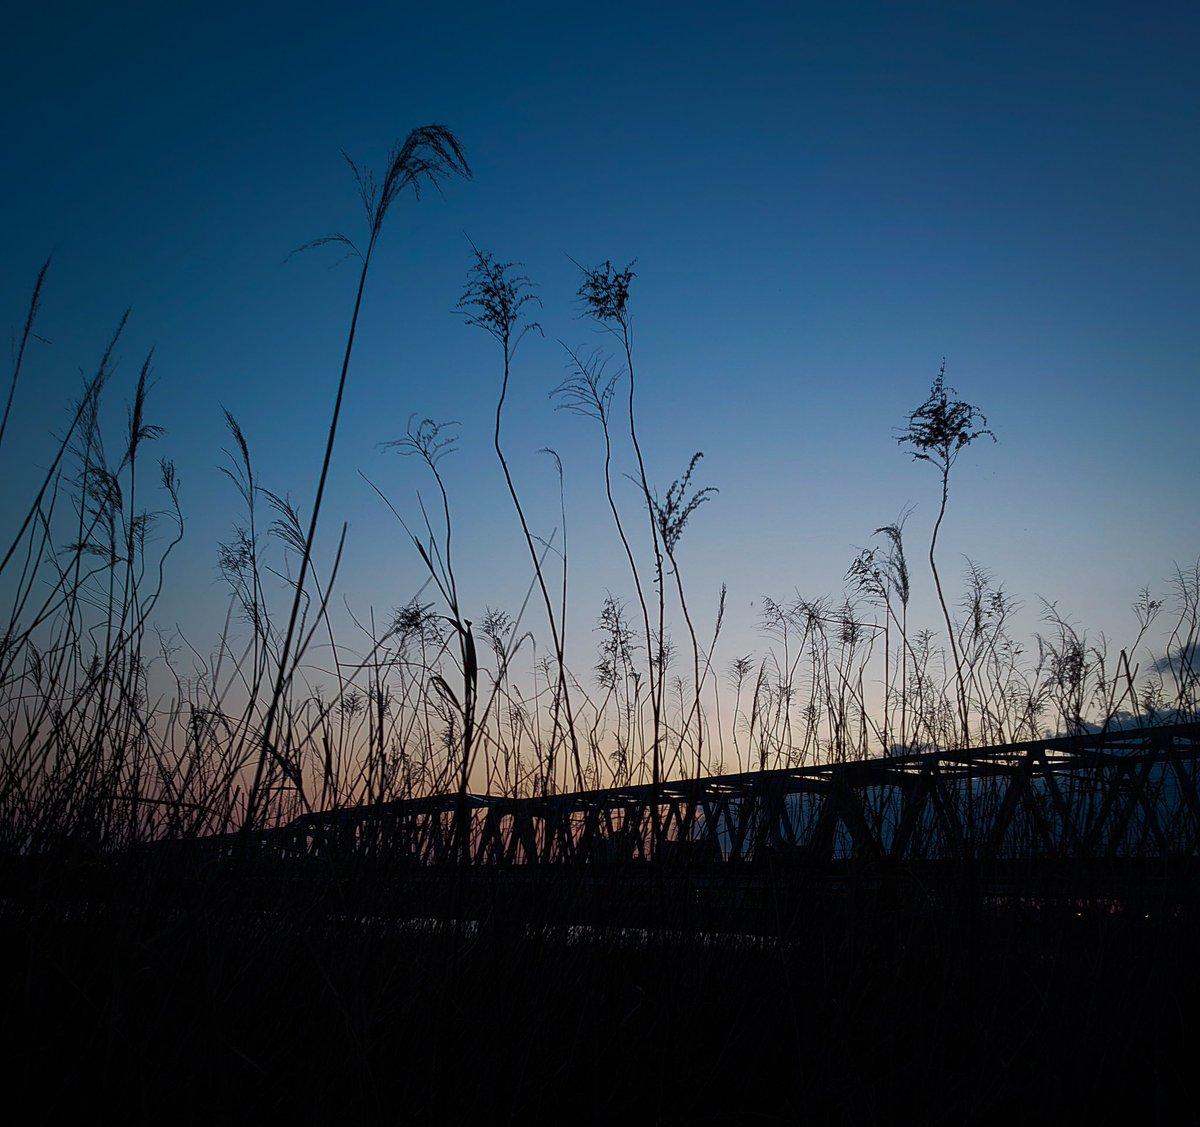 emotional #ファインダー越しの私の世界 #写真撮ってる人と繋がりたい #夕焼けpic.twitter.com/mBDByu1imE